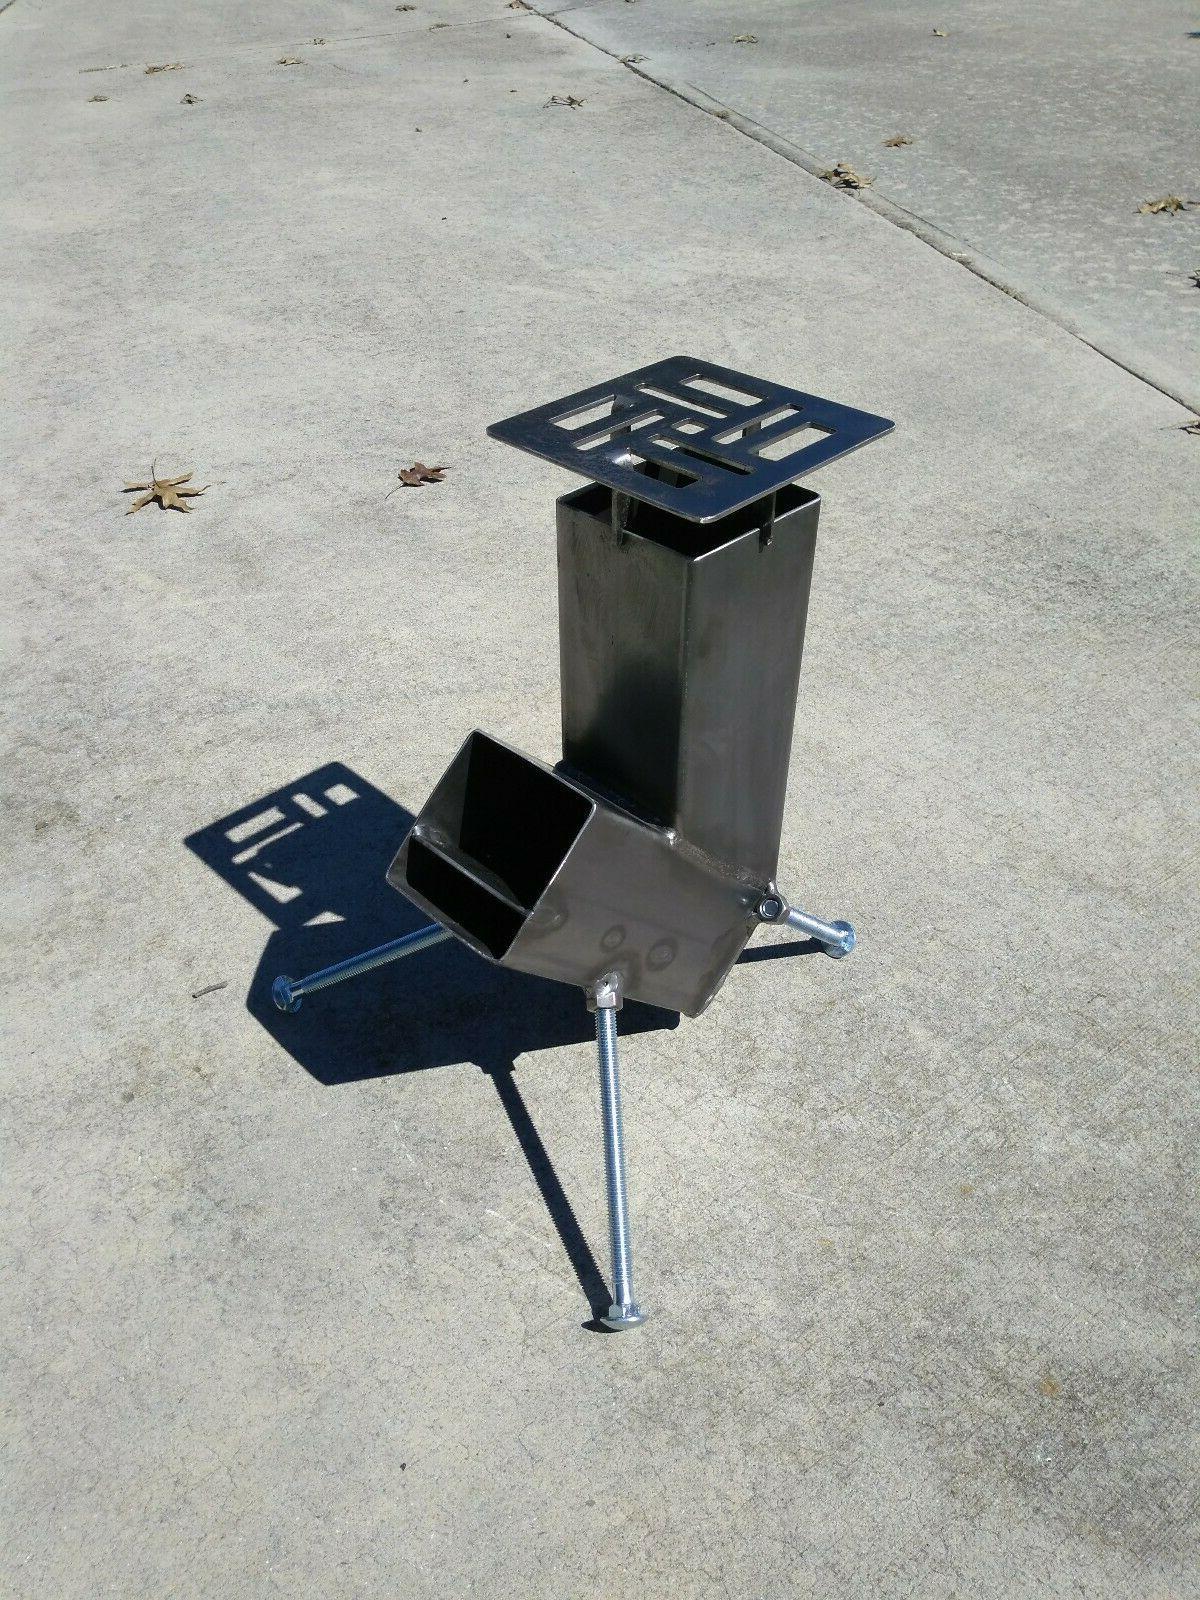 Rocket Feed Design be hurricane season camp stove